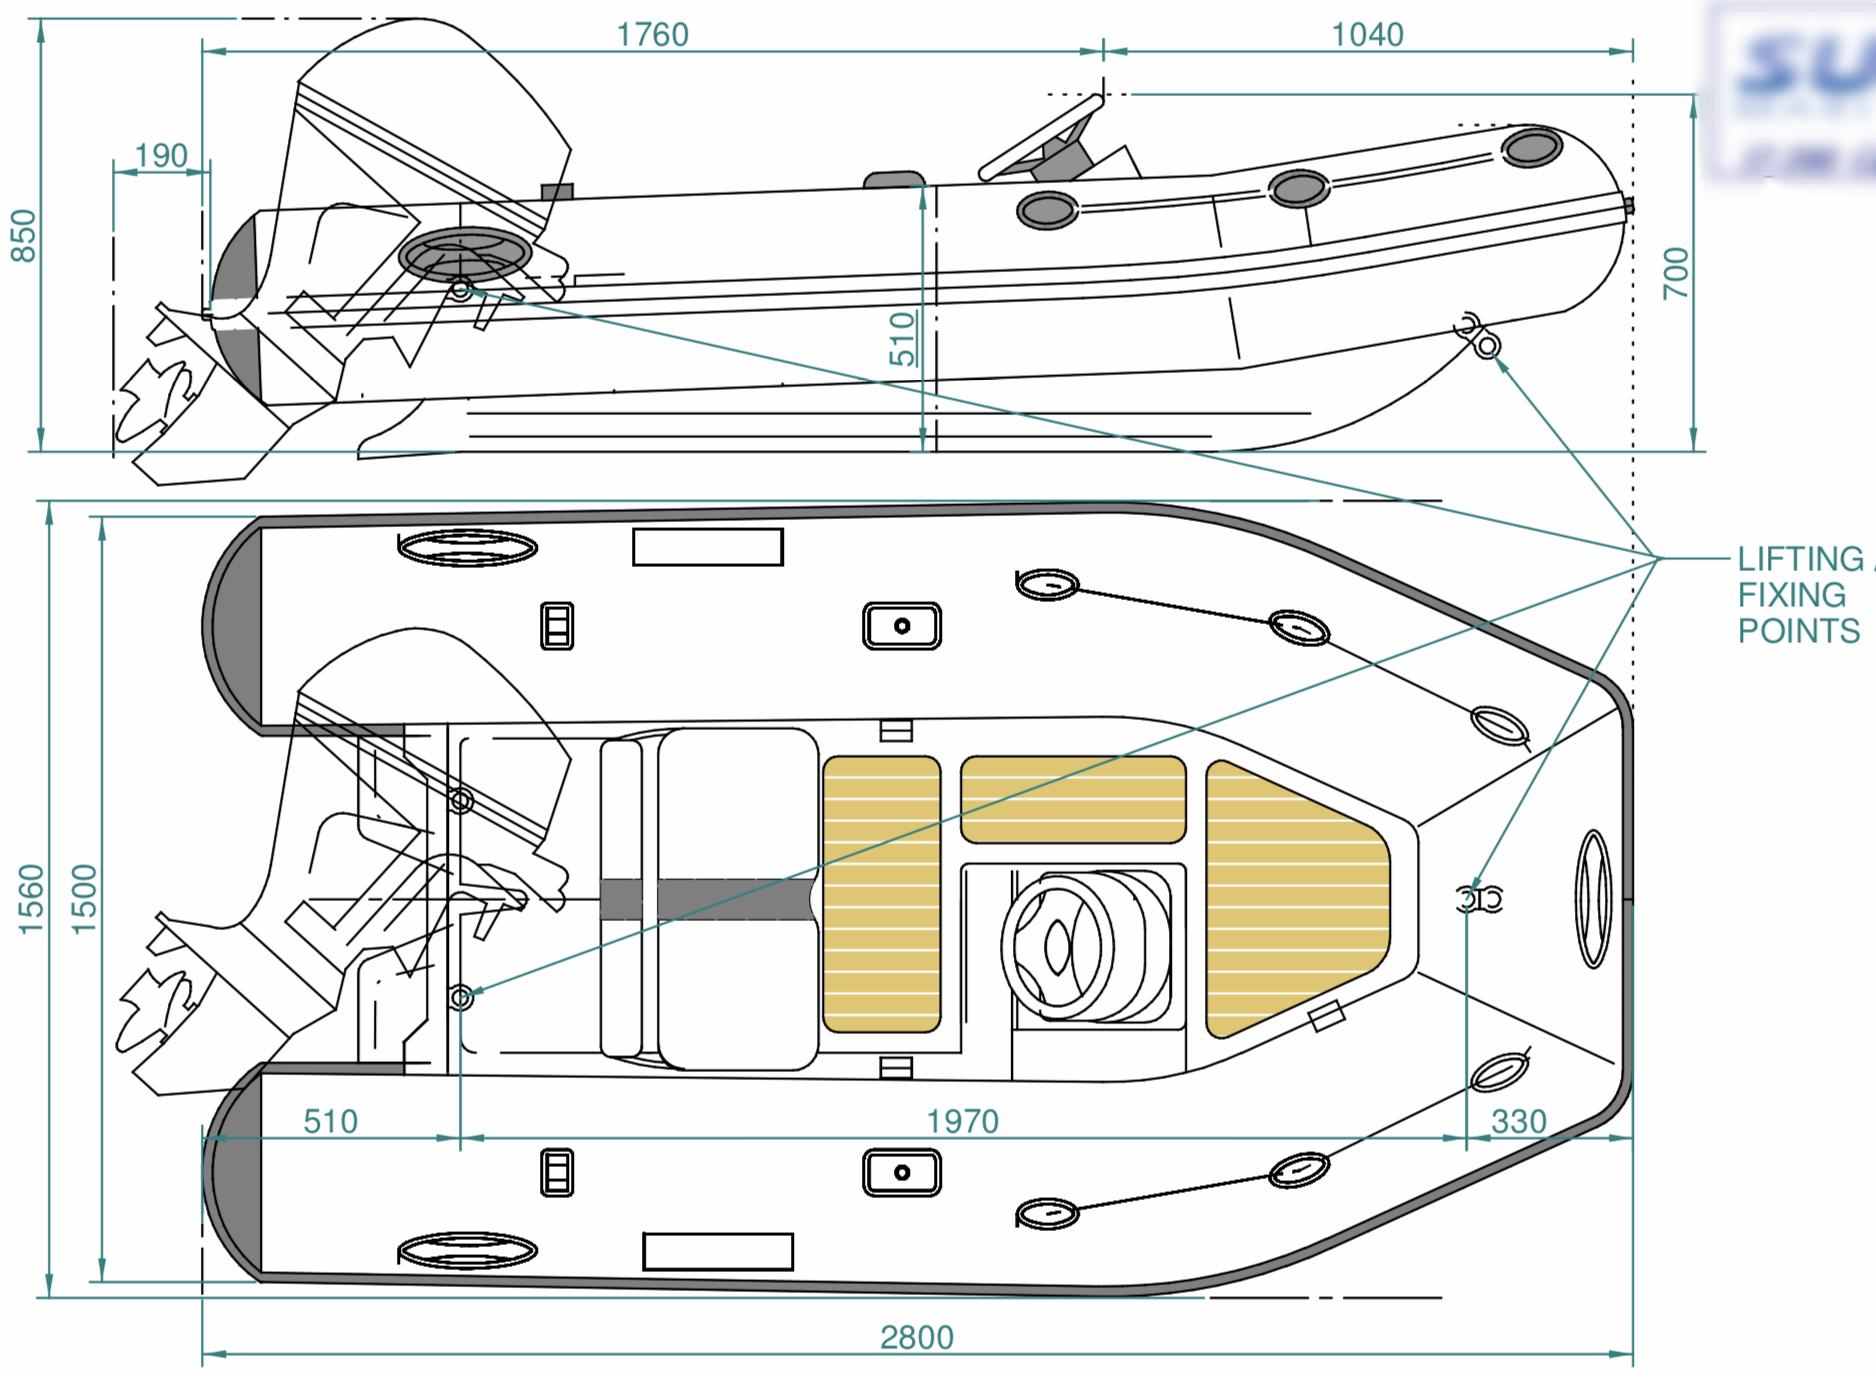 SUR Marine ST280 Classic